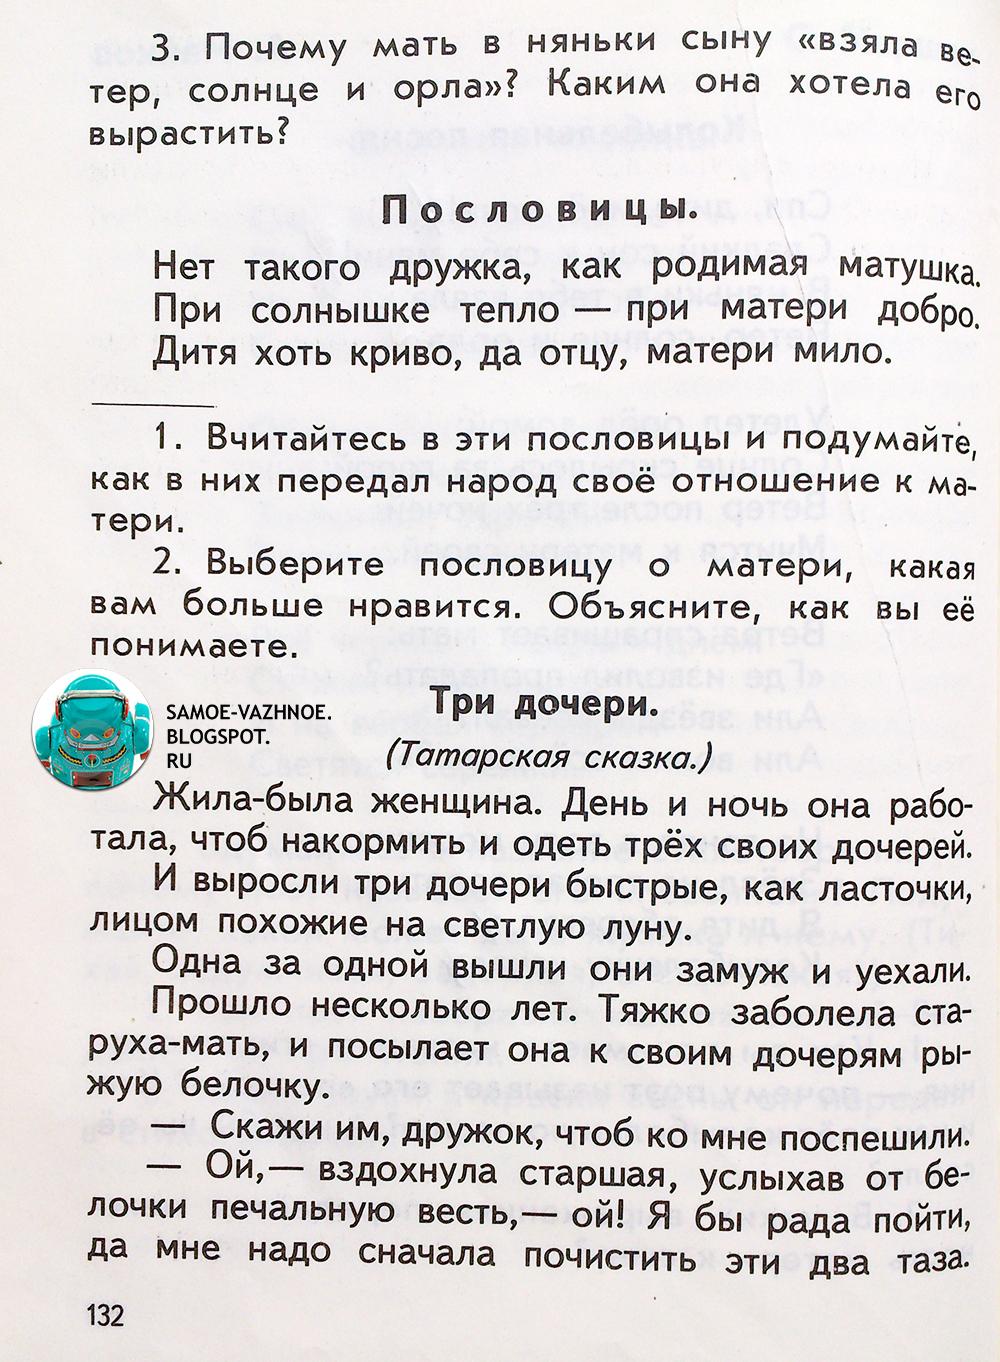 Три дочери татарская сказка